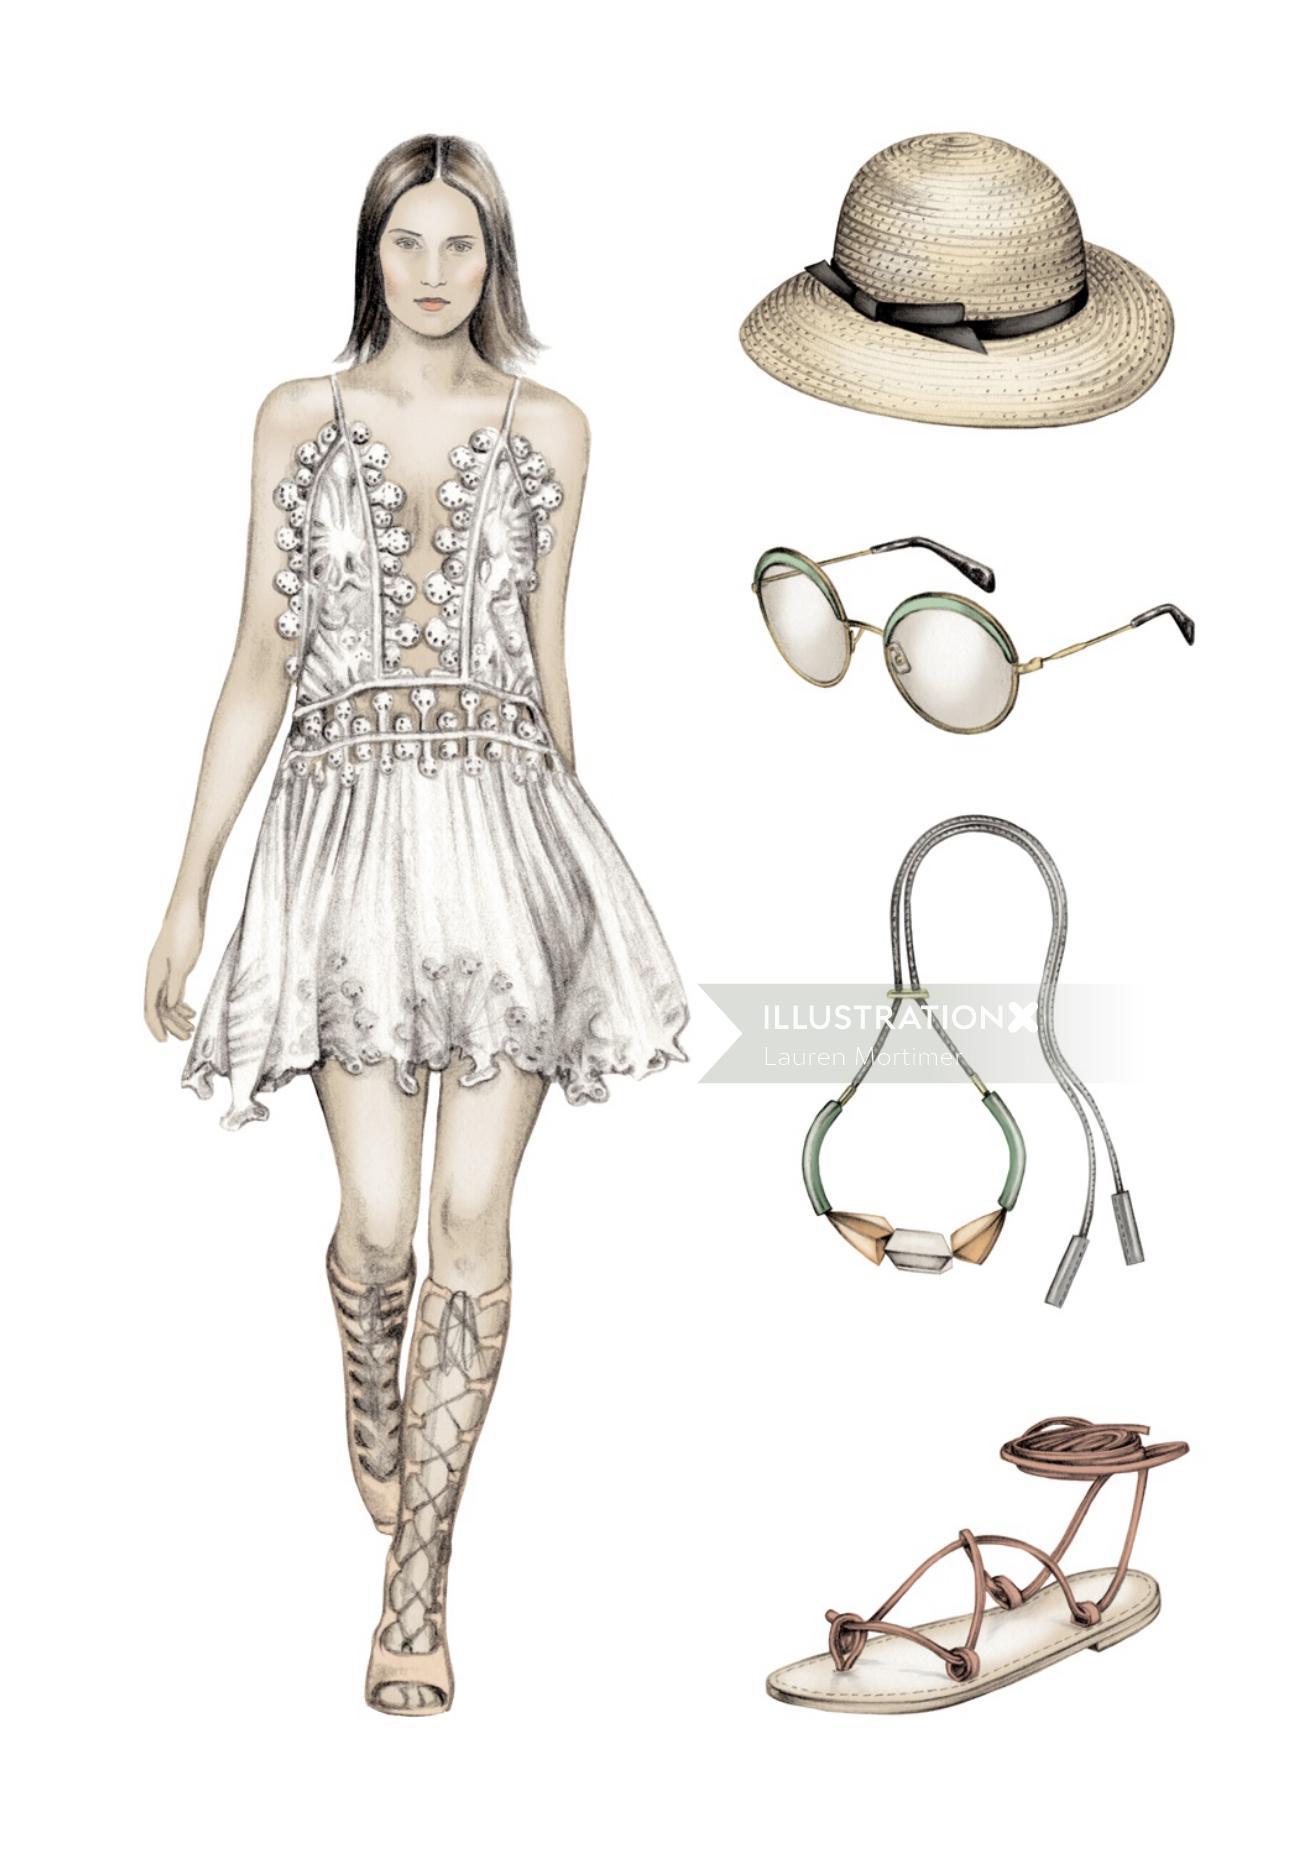 Fashion sketch of beautiful lady